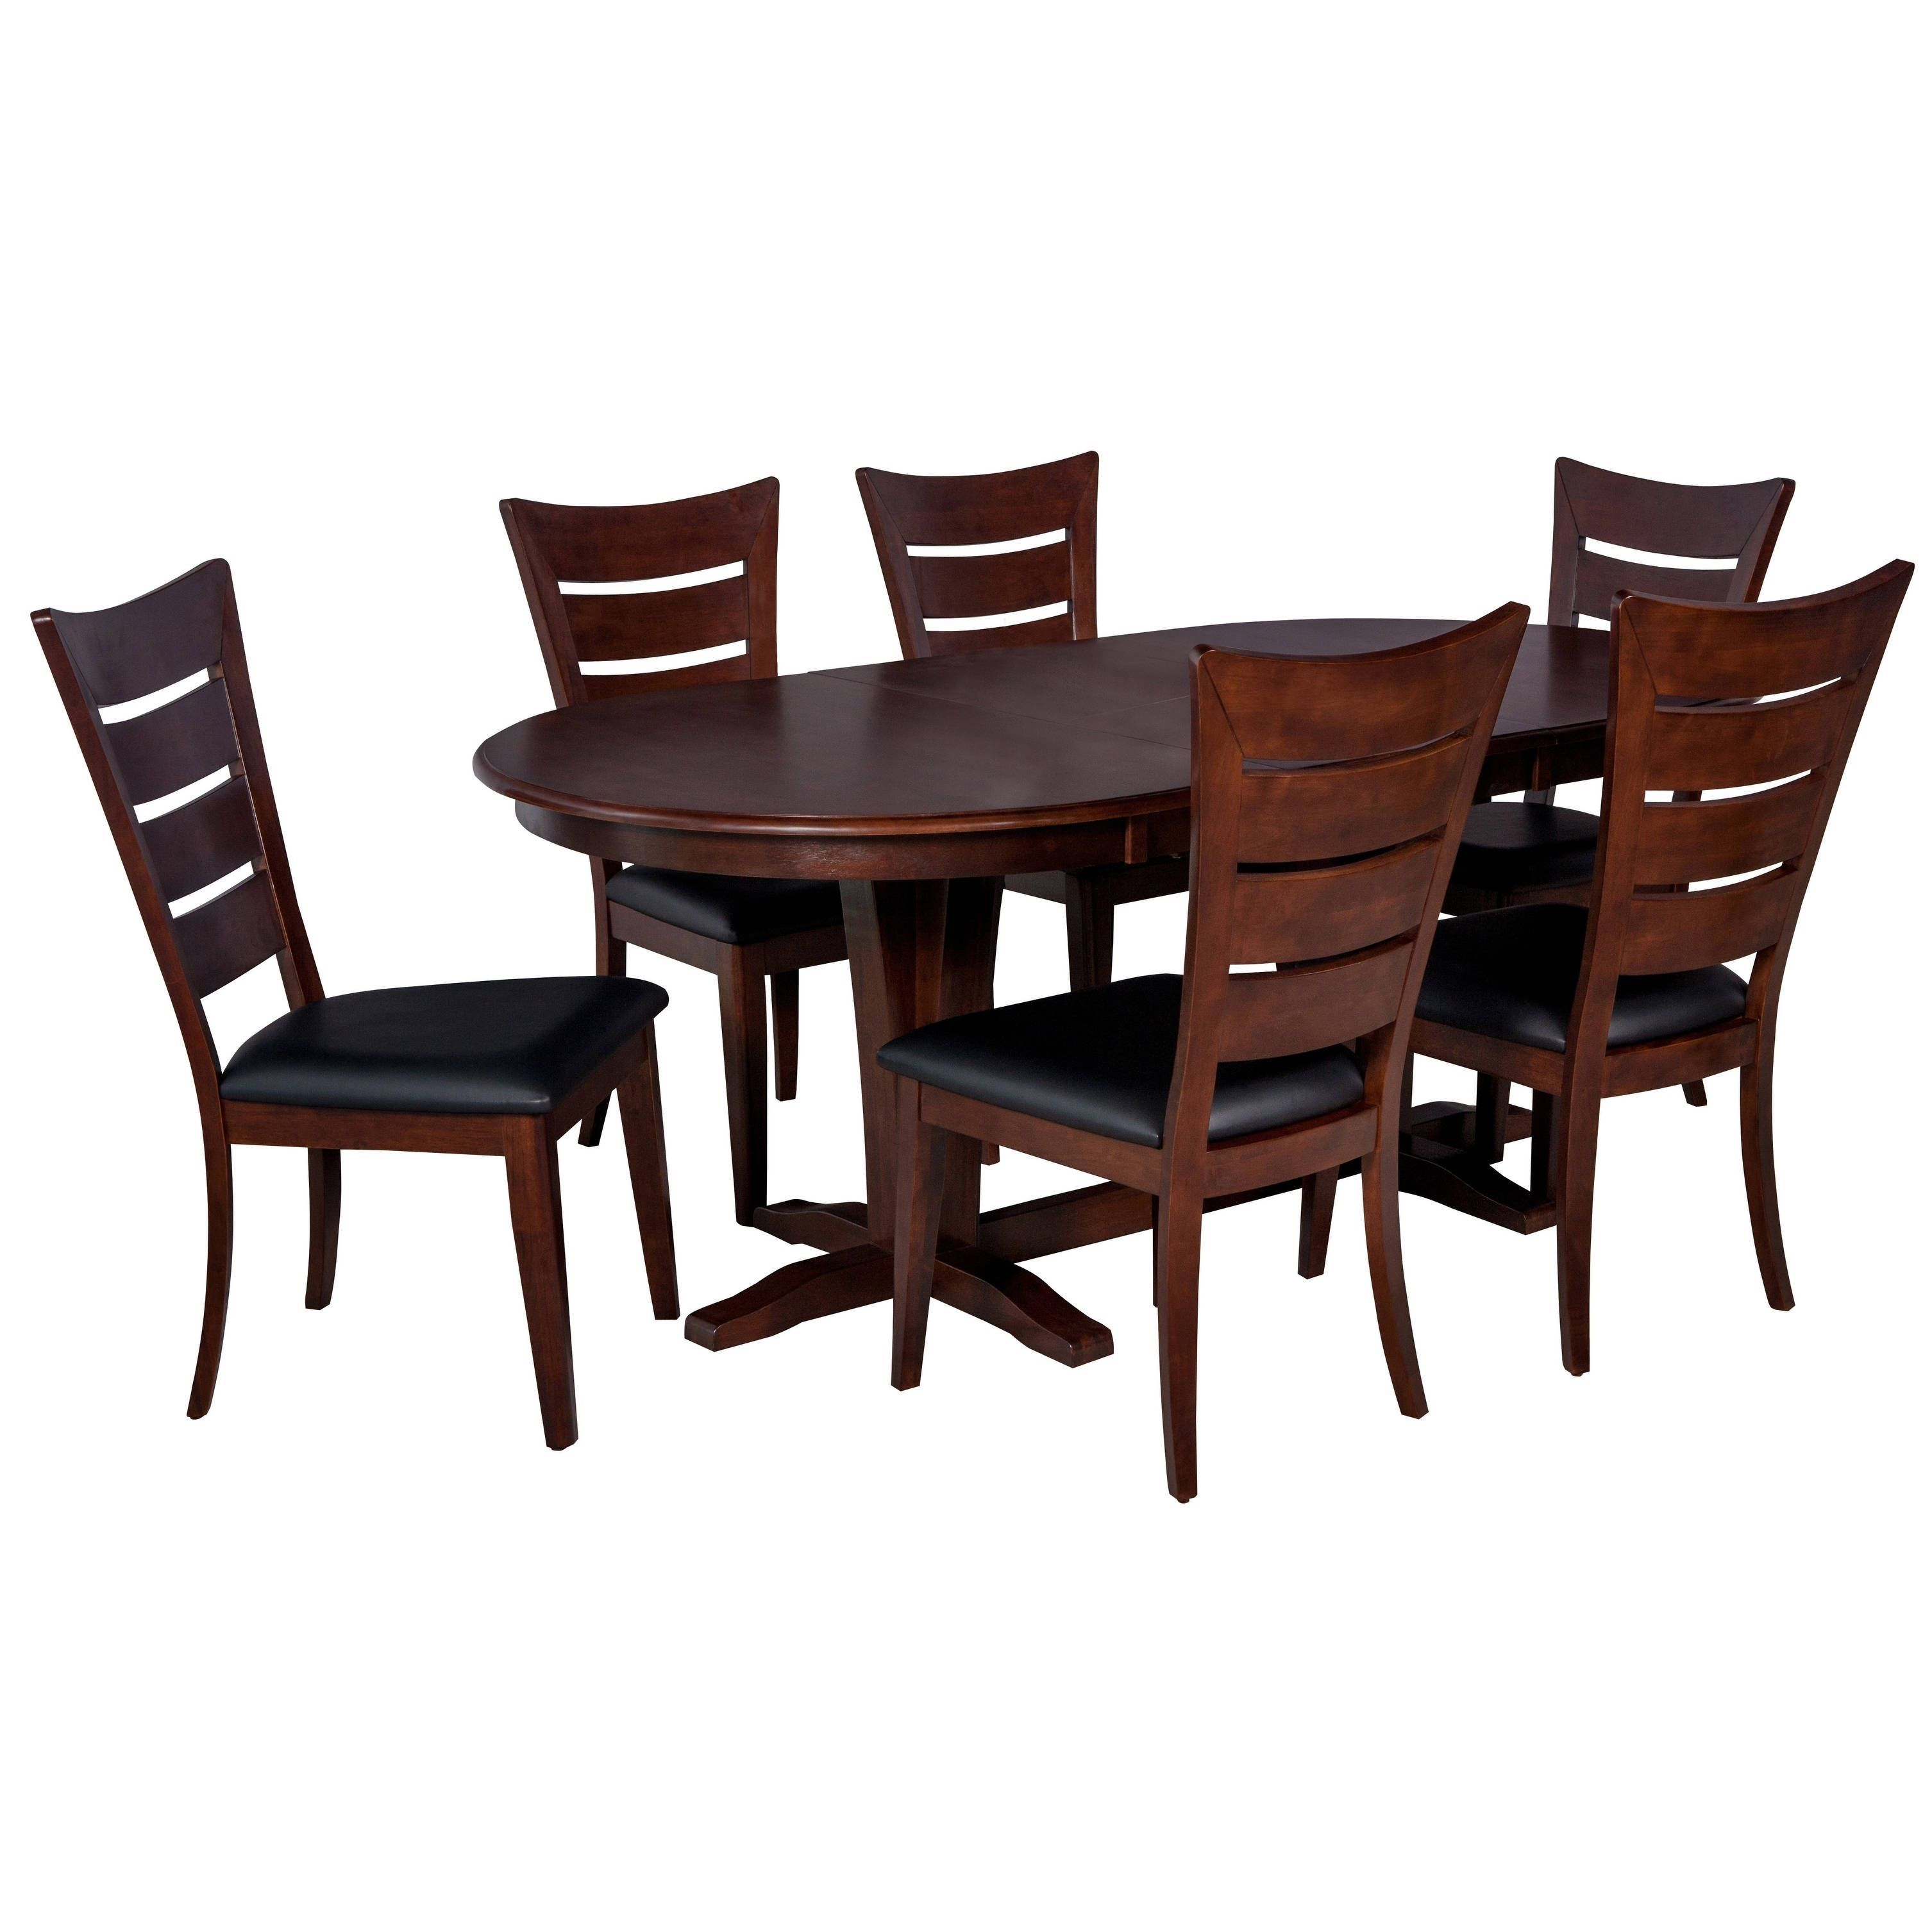 Ttp furnish piece solid wood dining set